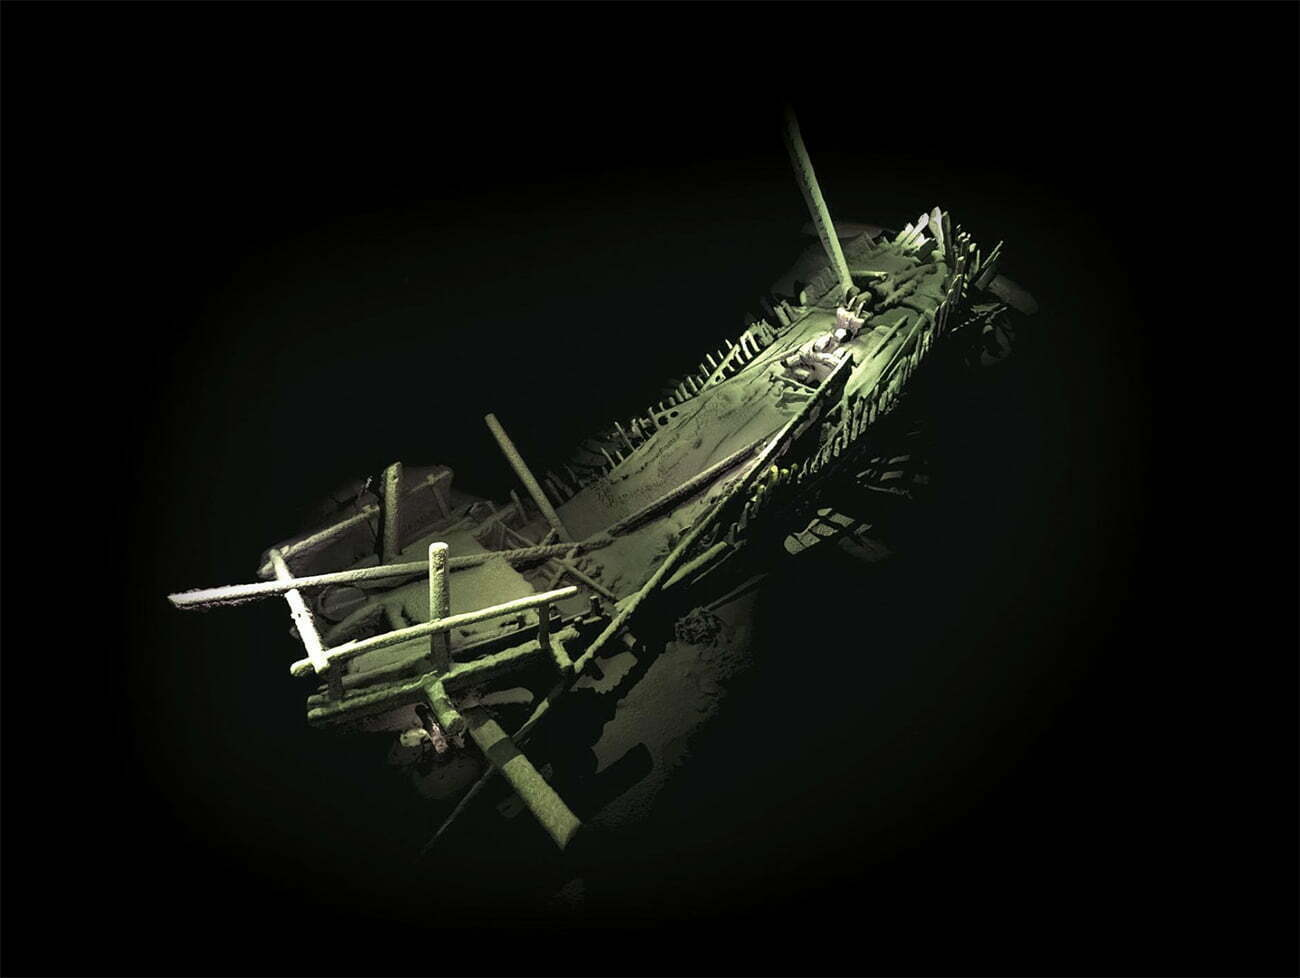 imagem de naufrágio no Mar Negro